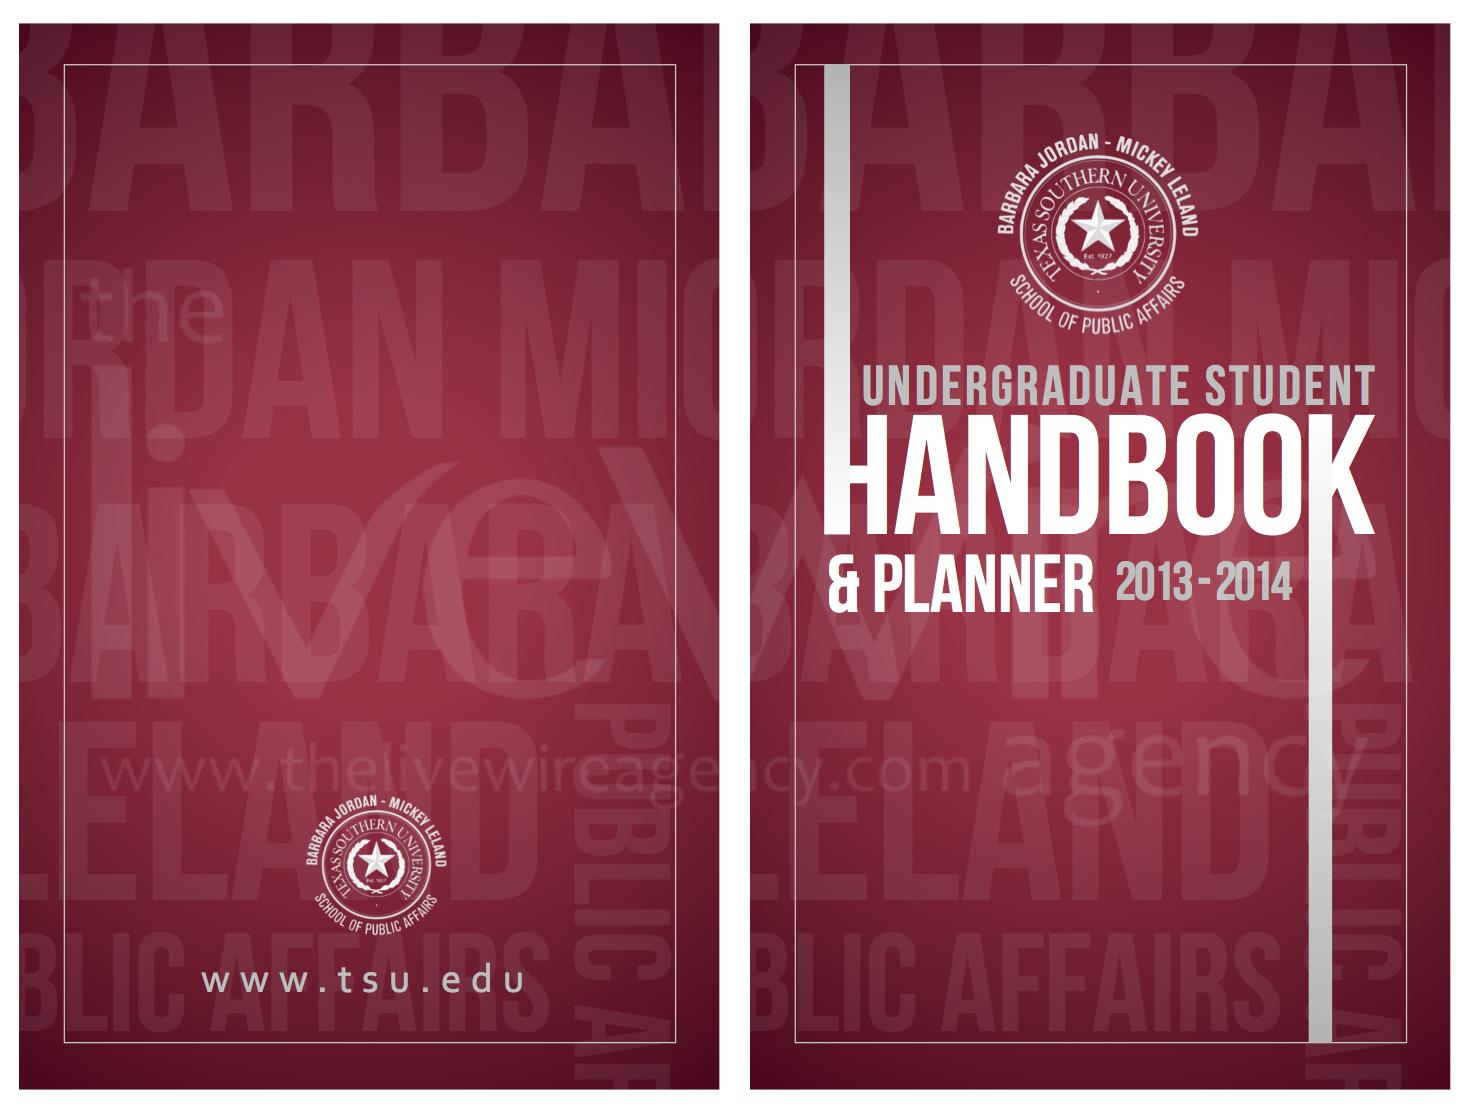 TSU Undergrad Student Handbook